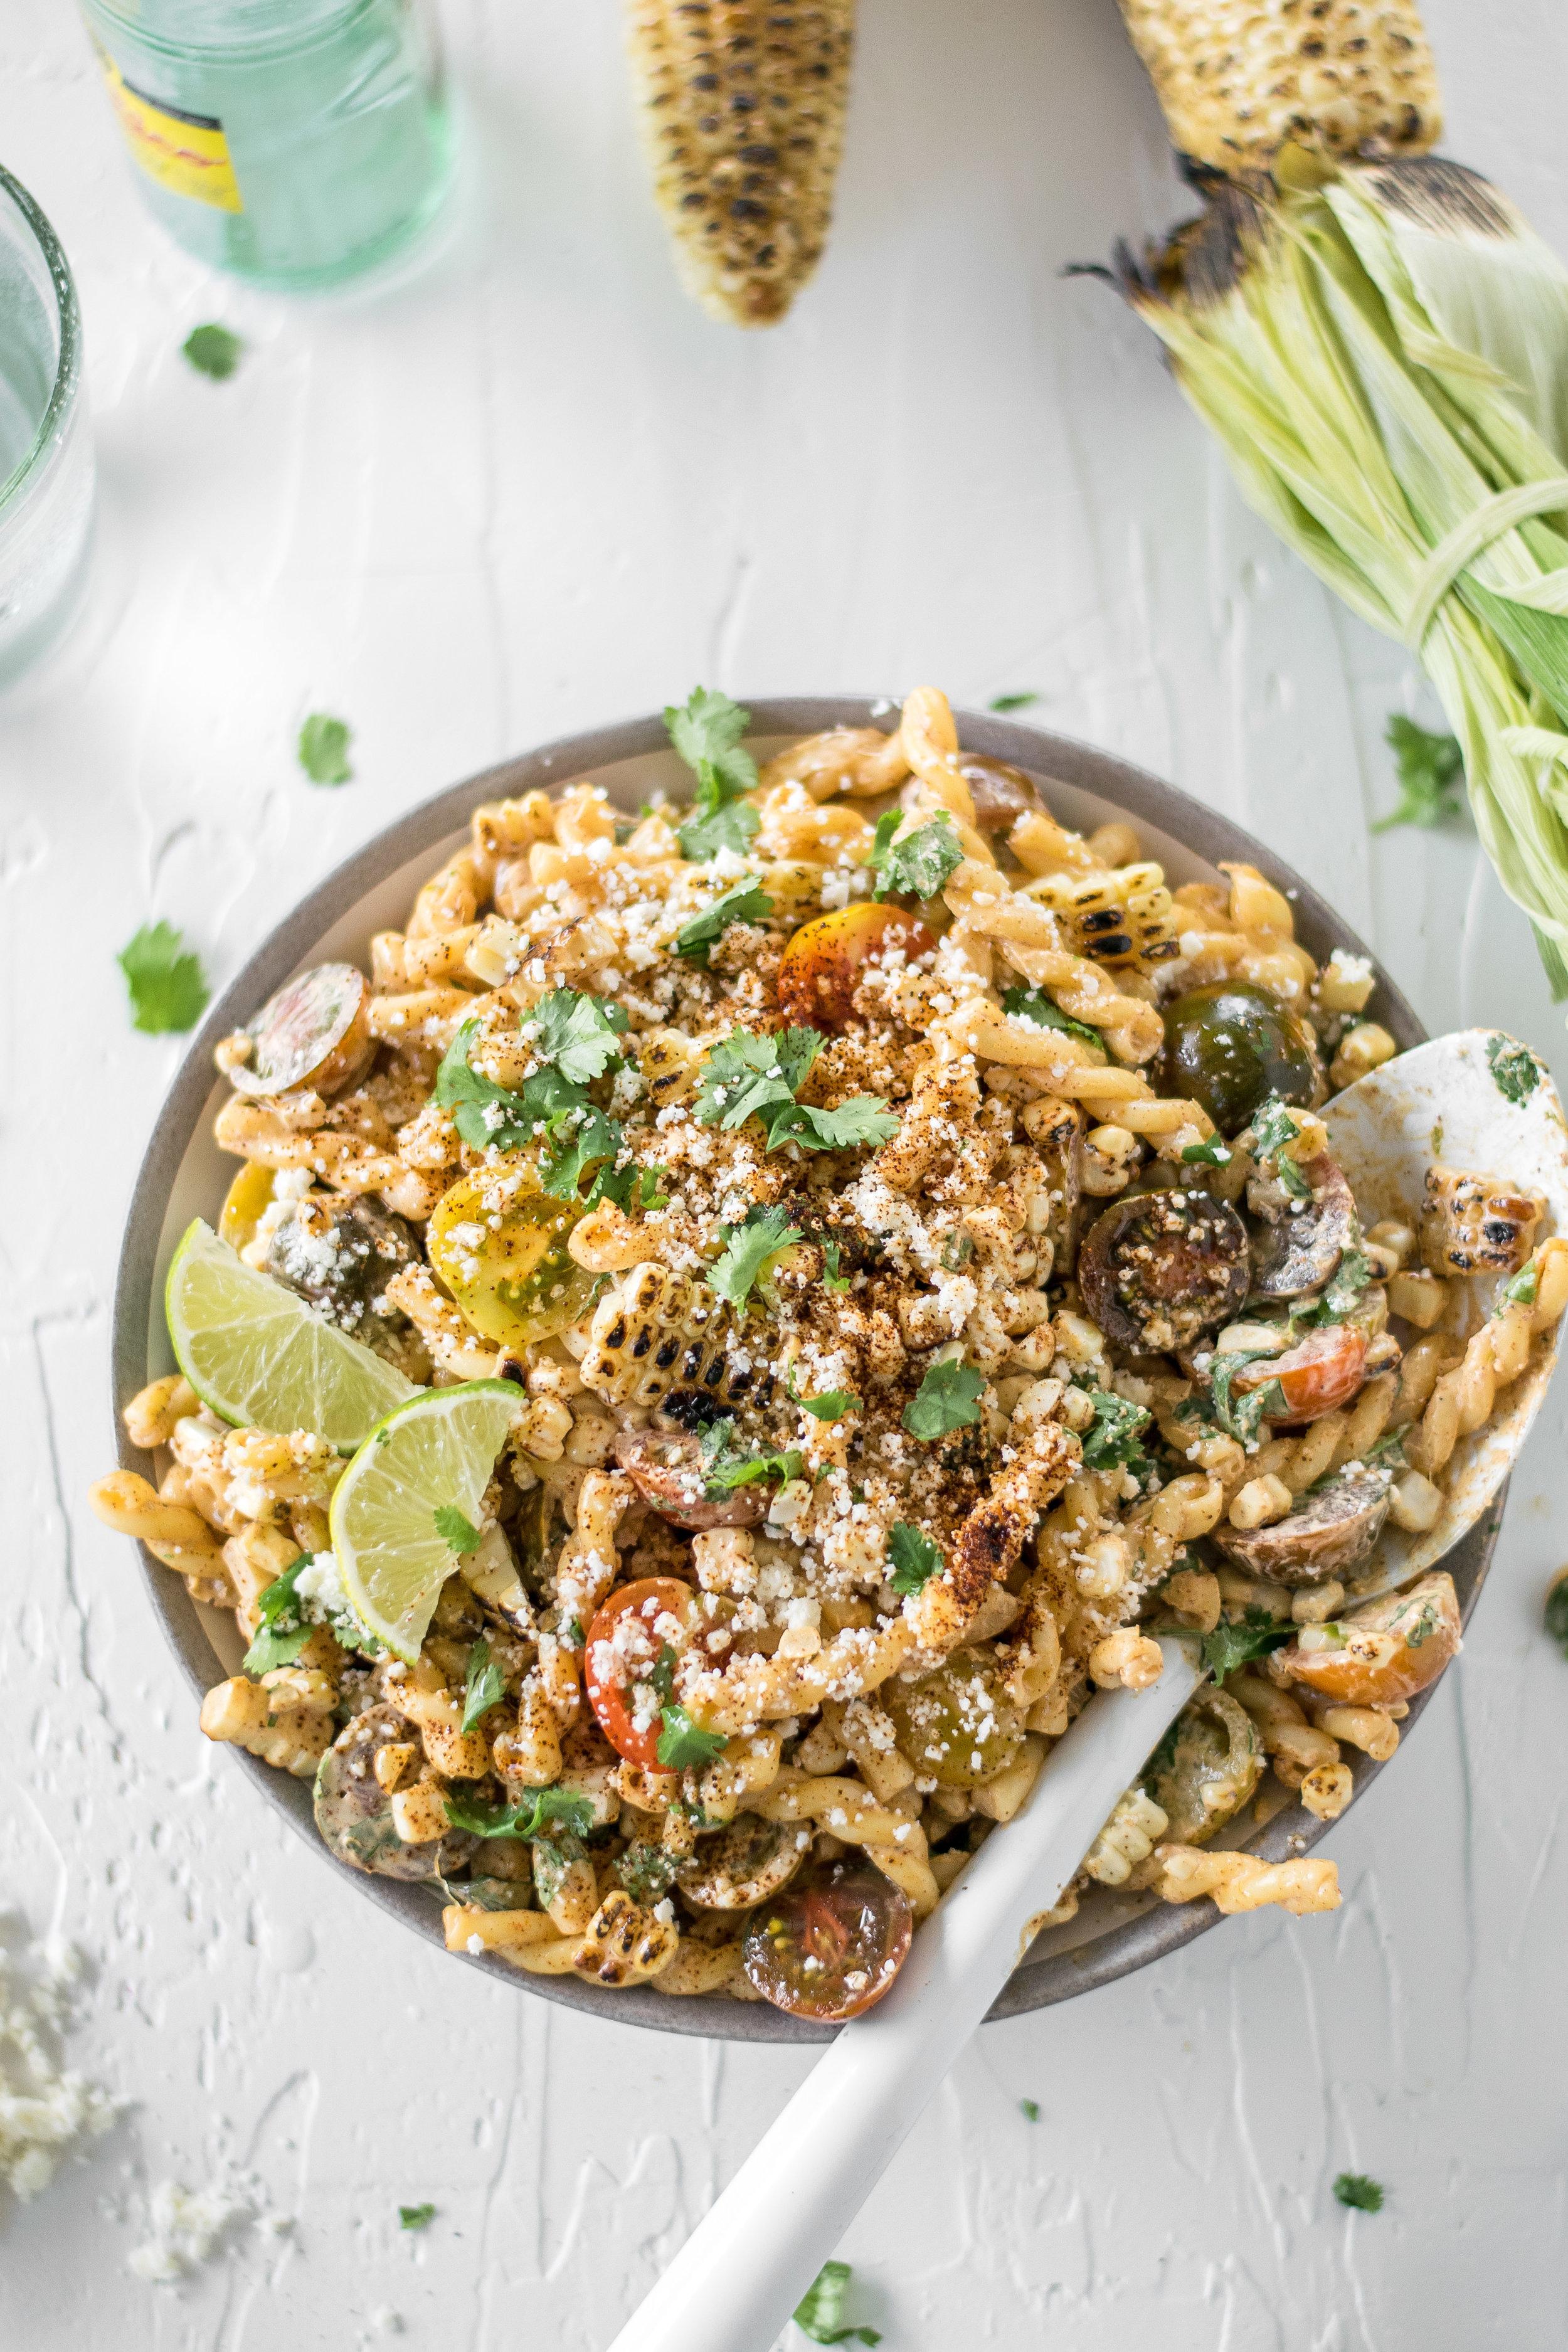 Mexican Street Corn Pasta Salad | All Purpose Flour Child